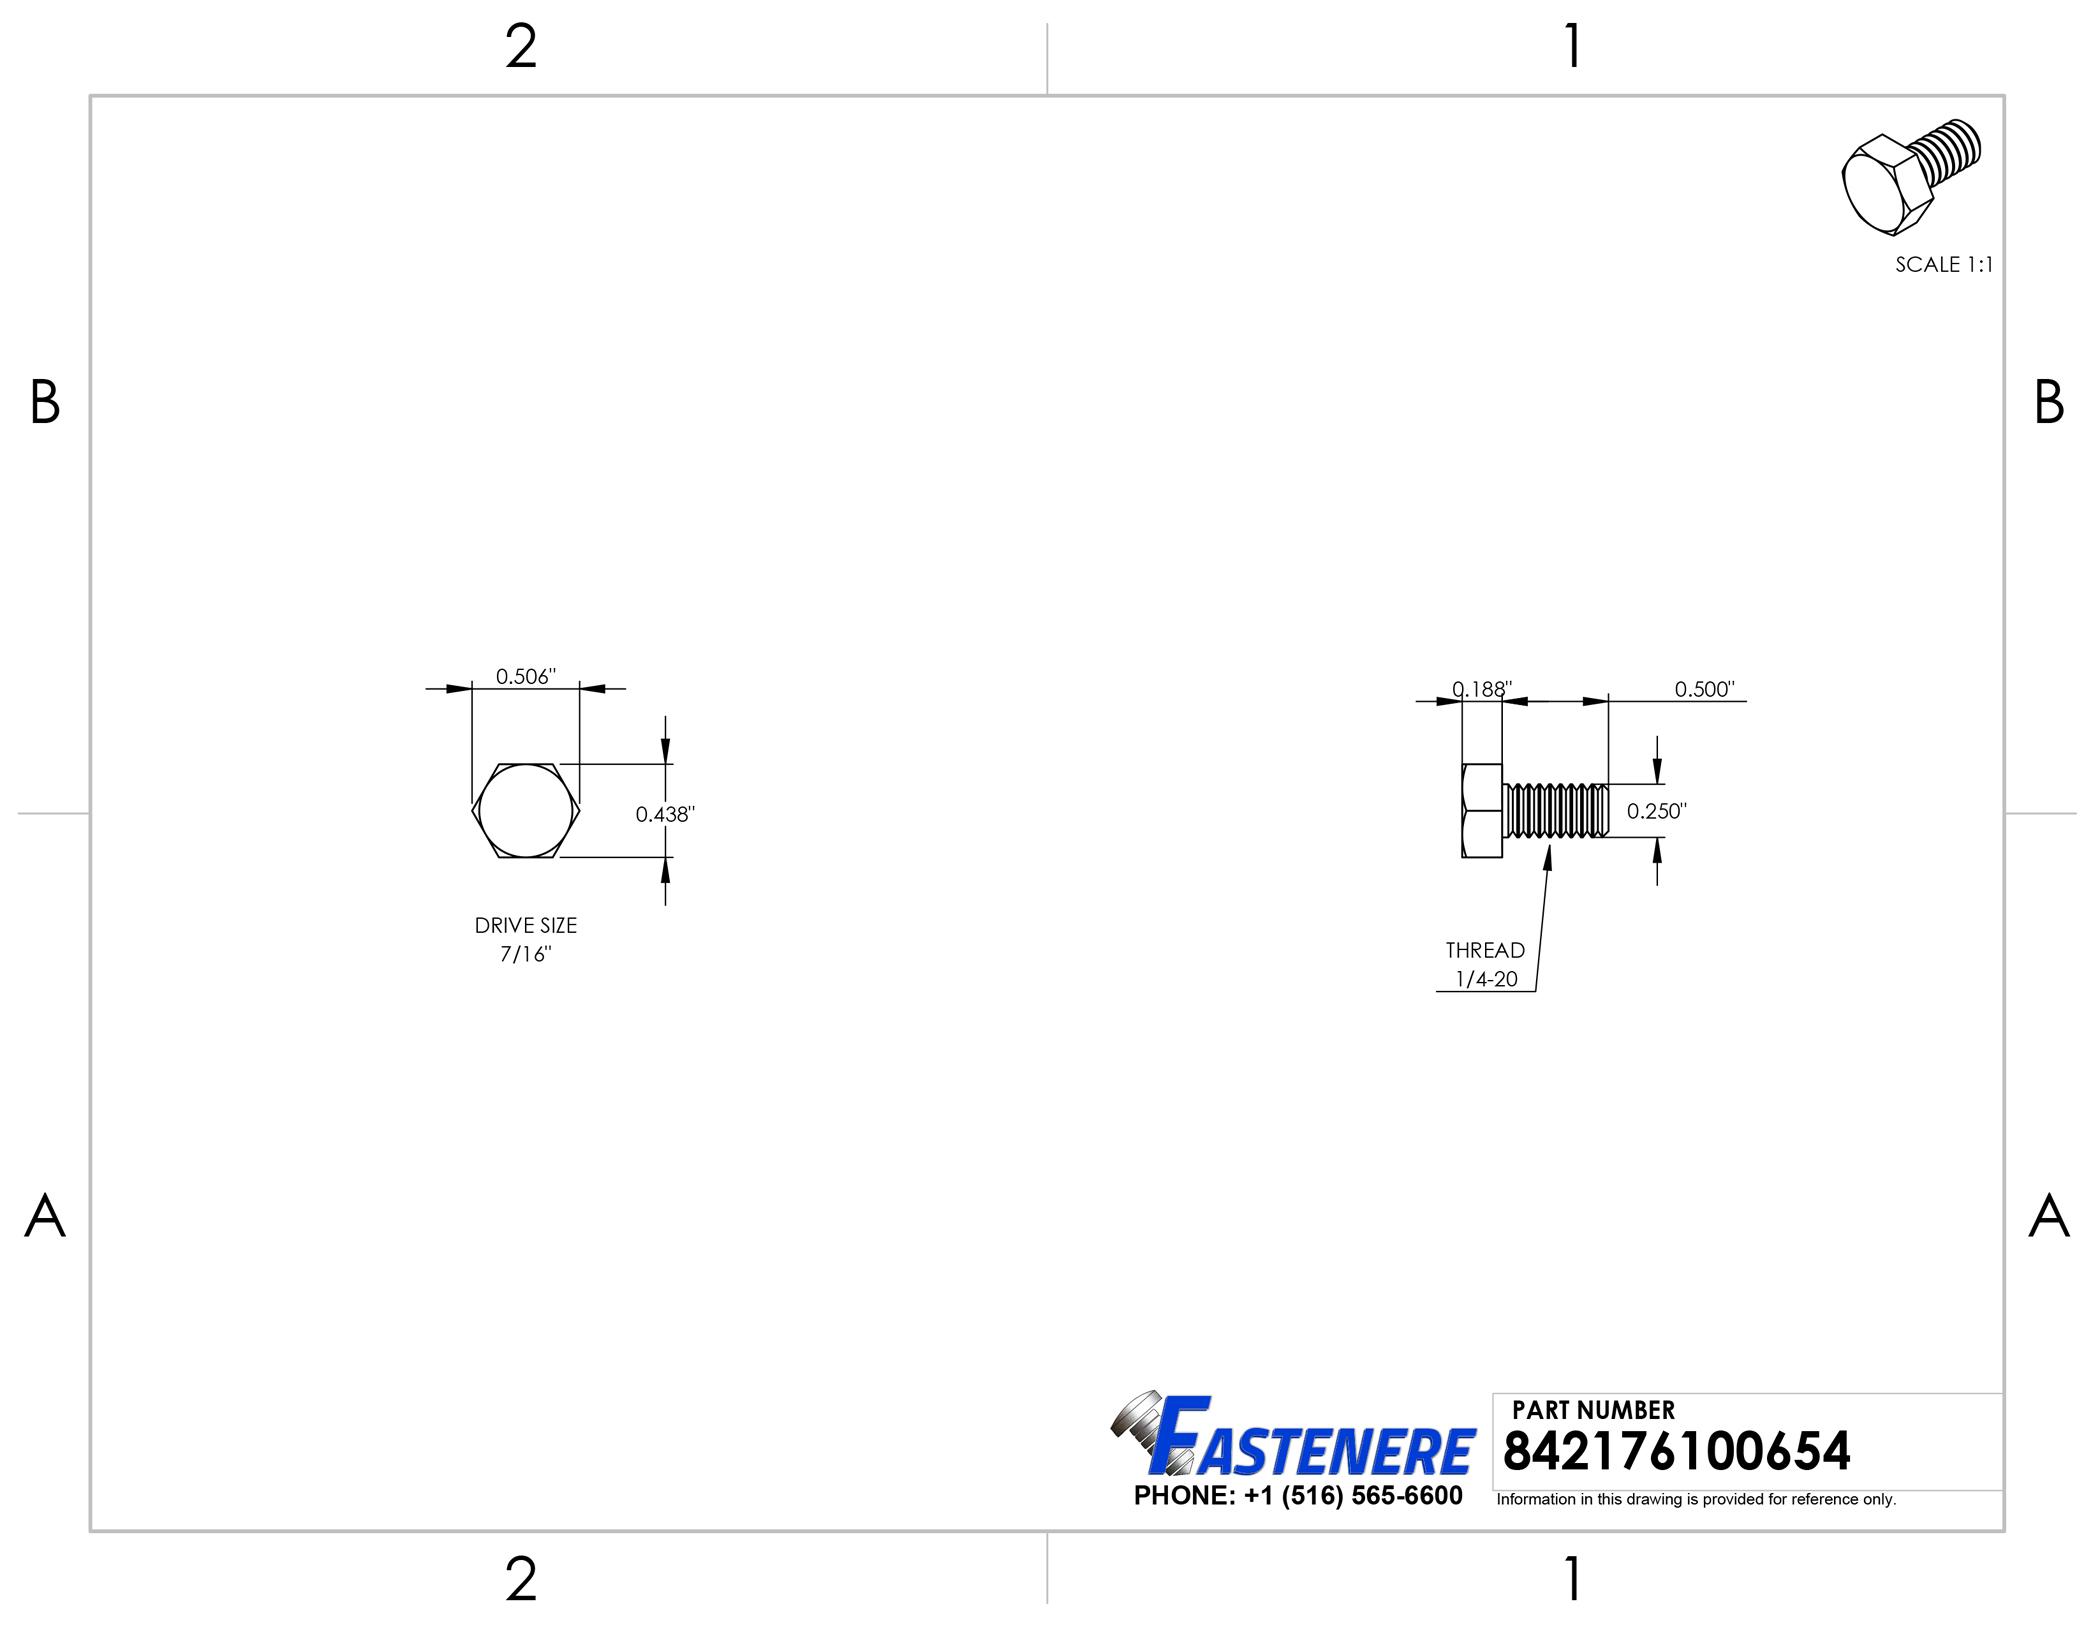 Pure Copper//Pack of 10/Quality: Basic Aparoli SJA 67910/QB DIN 933//Hexagonal Screws with Thread up to Head 10.9/